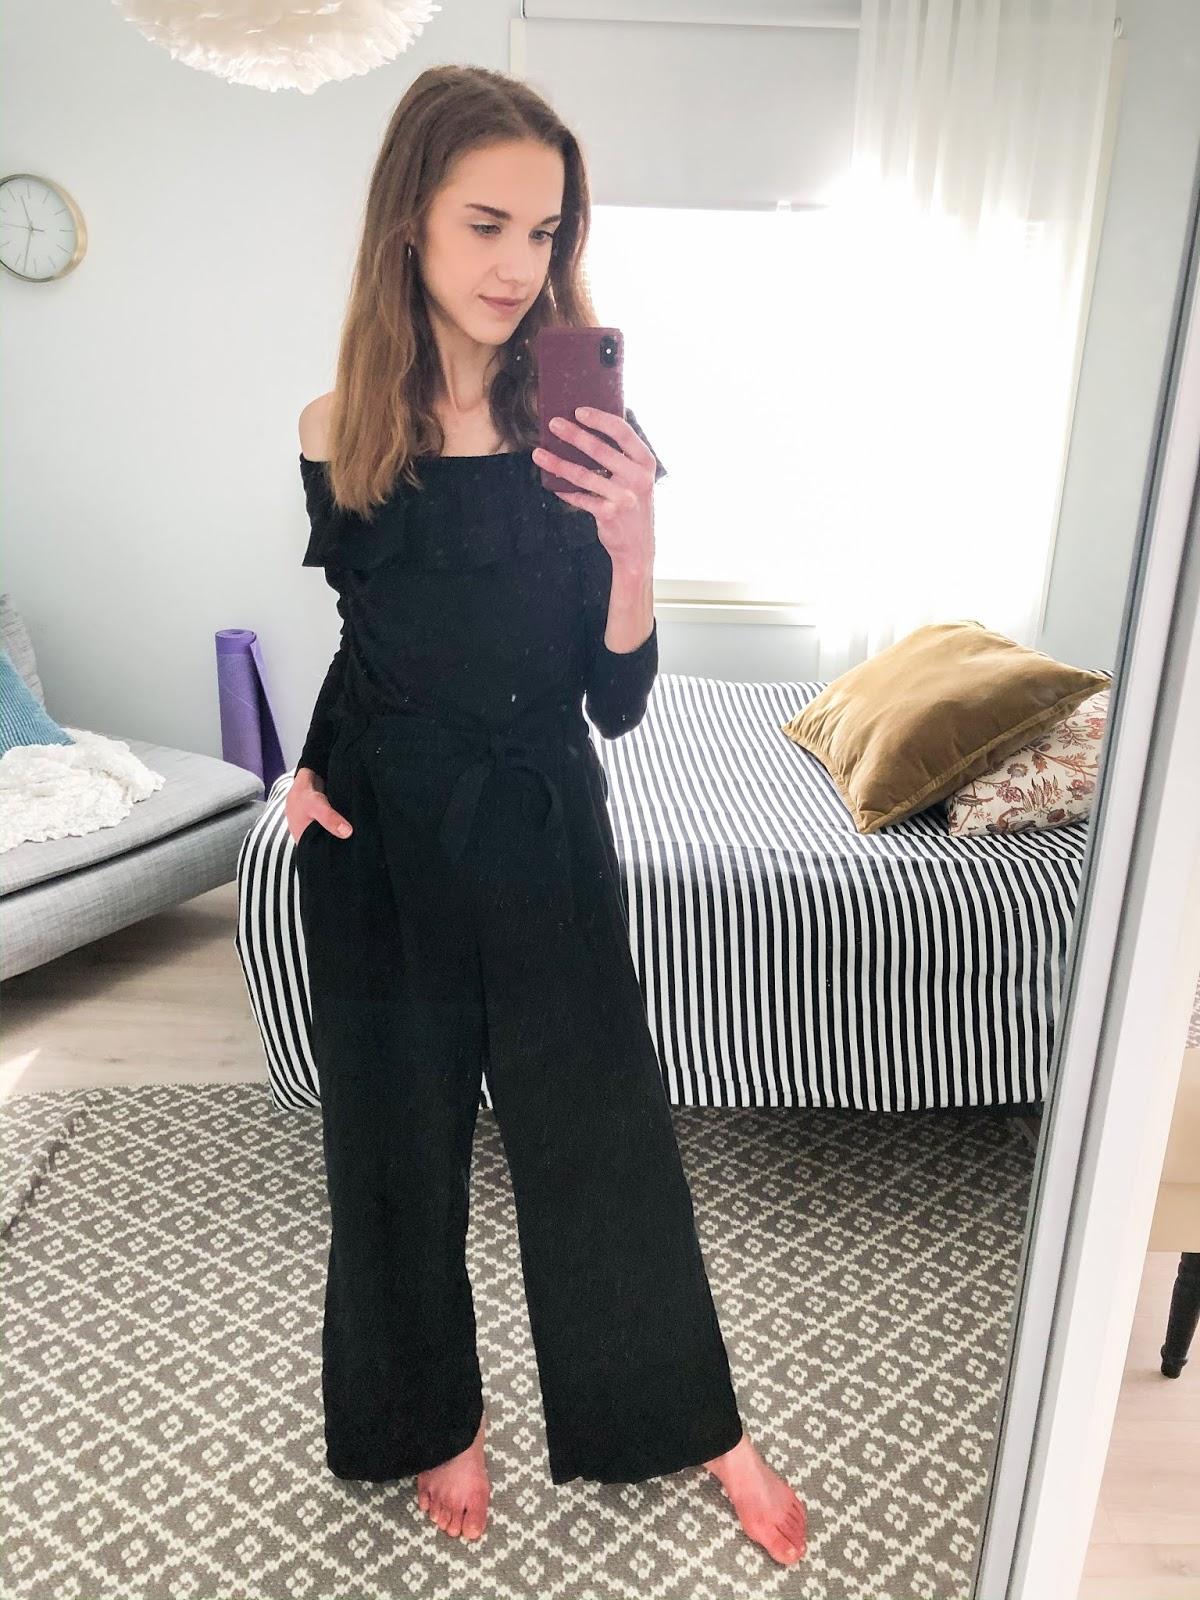 All black outfit for working from home - Kokomusta asu, muotibloggaaja, kotitoimisto